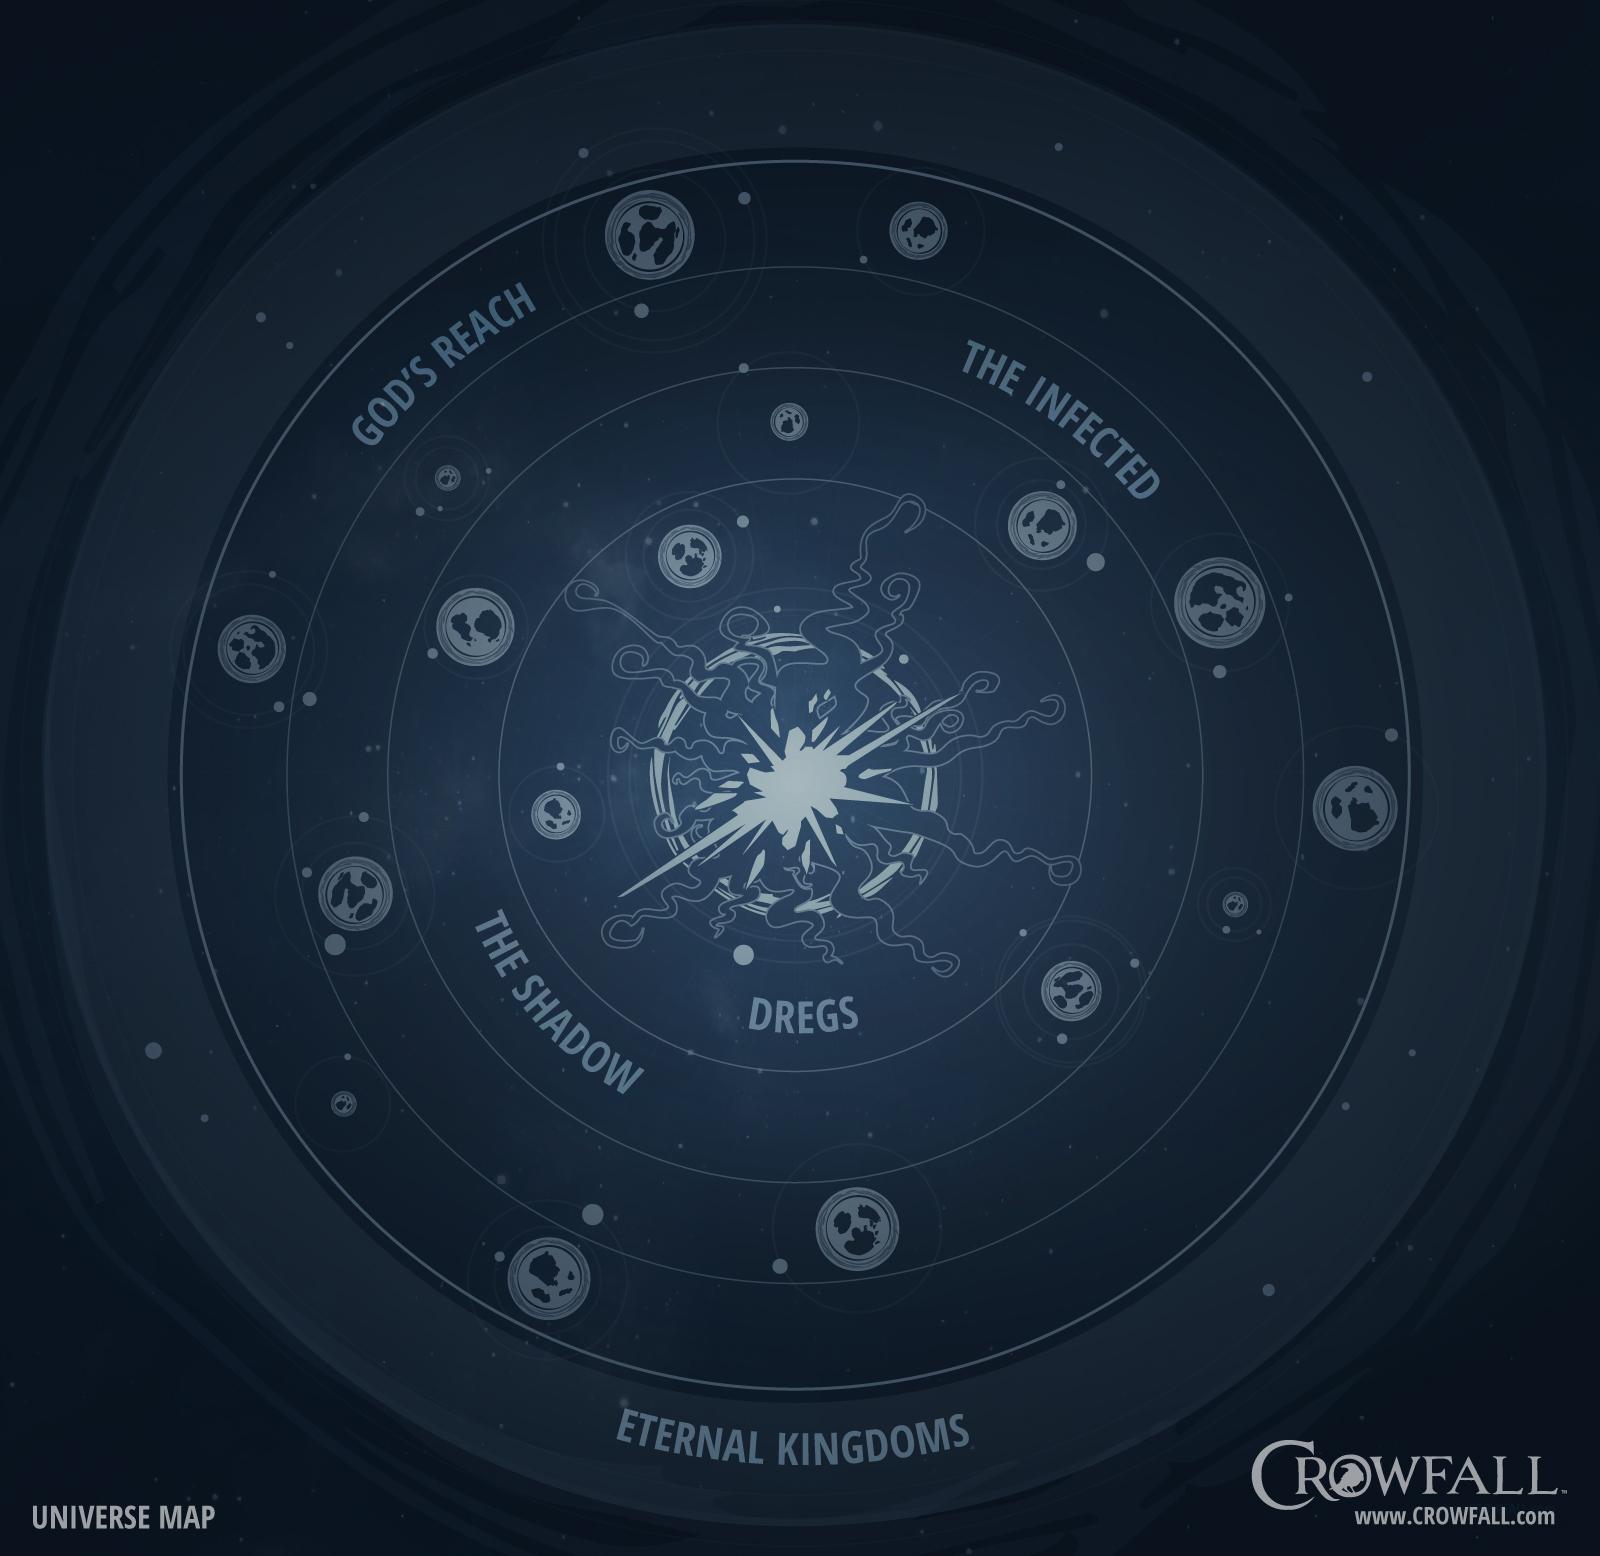 Crowfall_UniverseMap.jpg